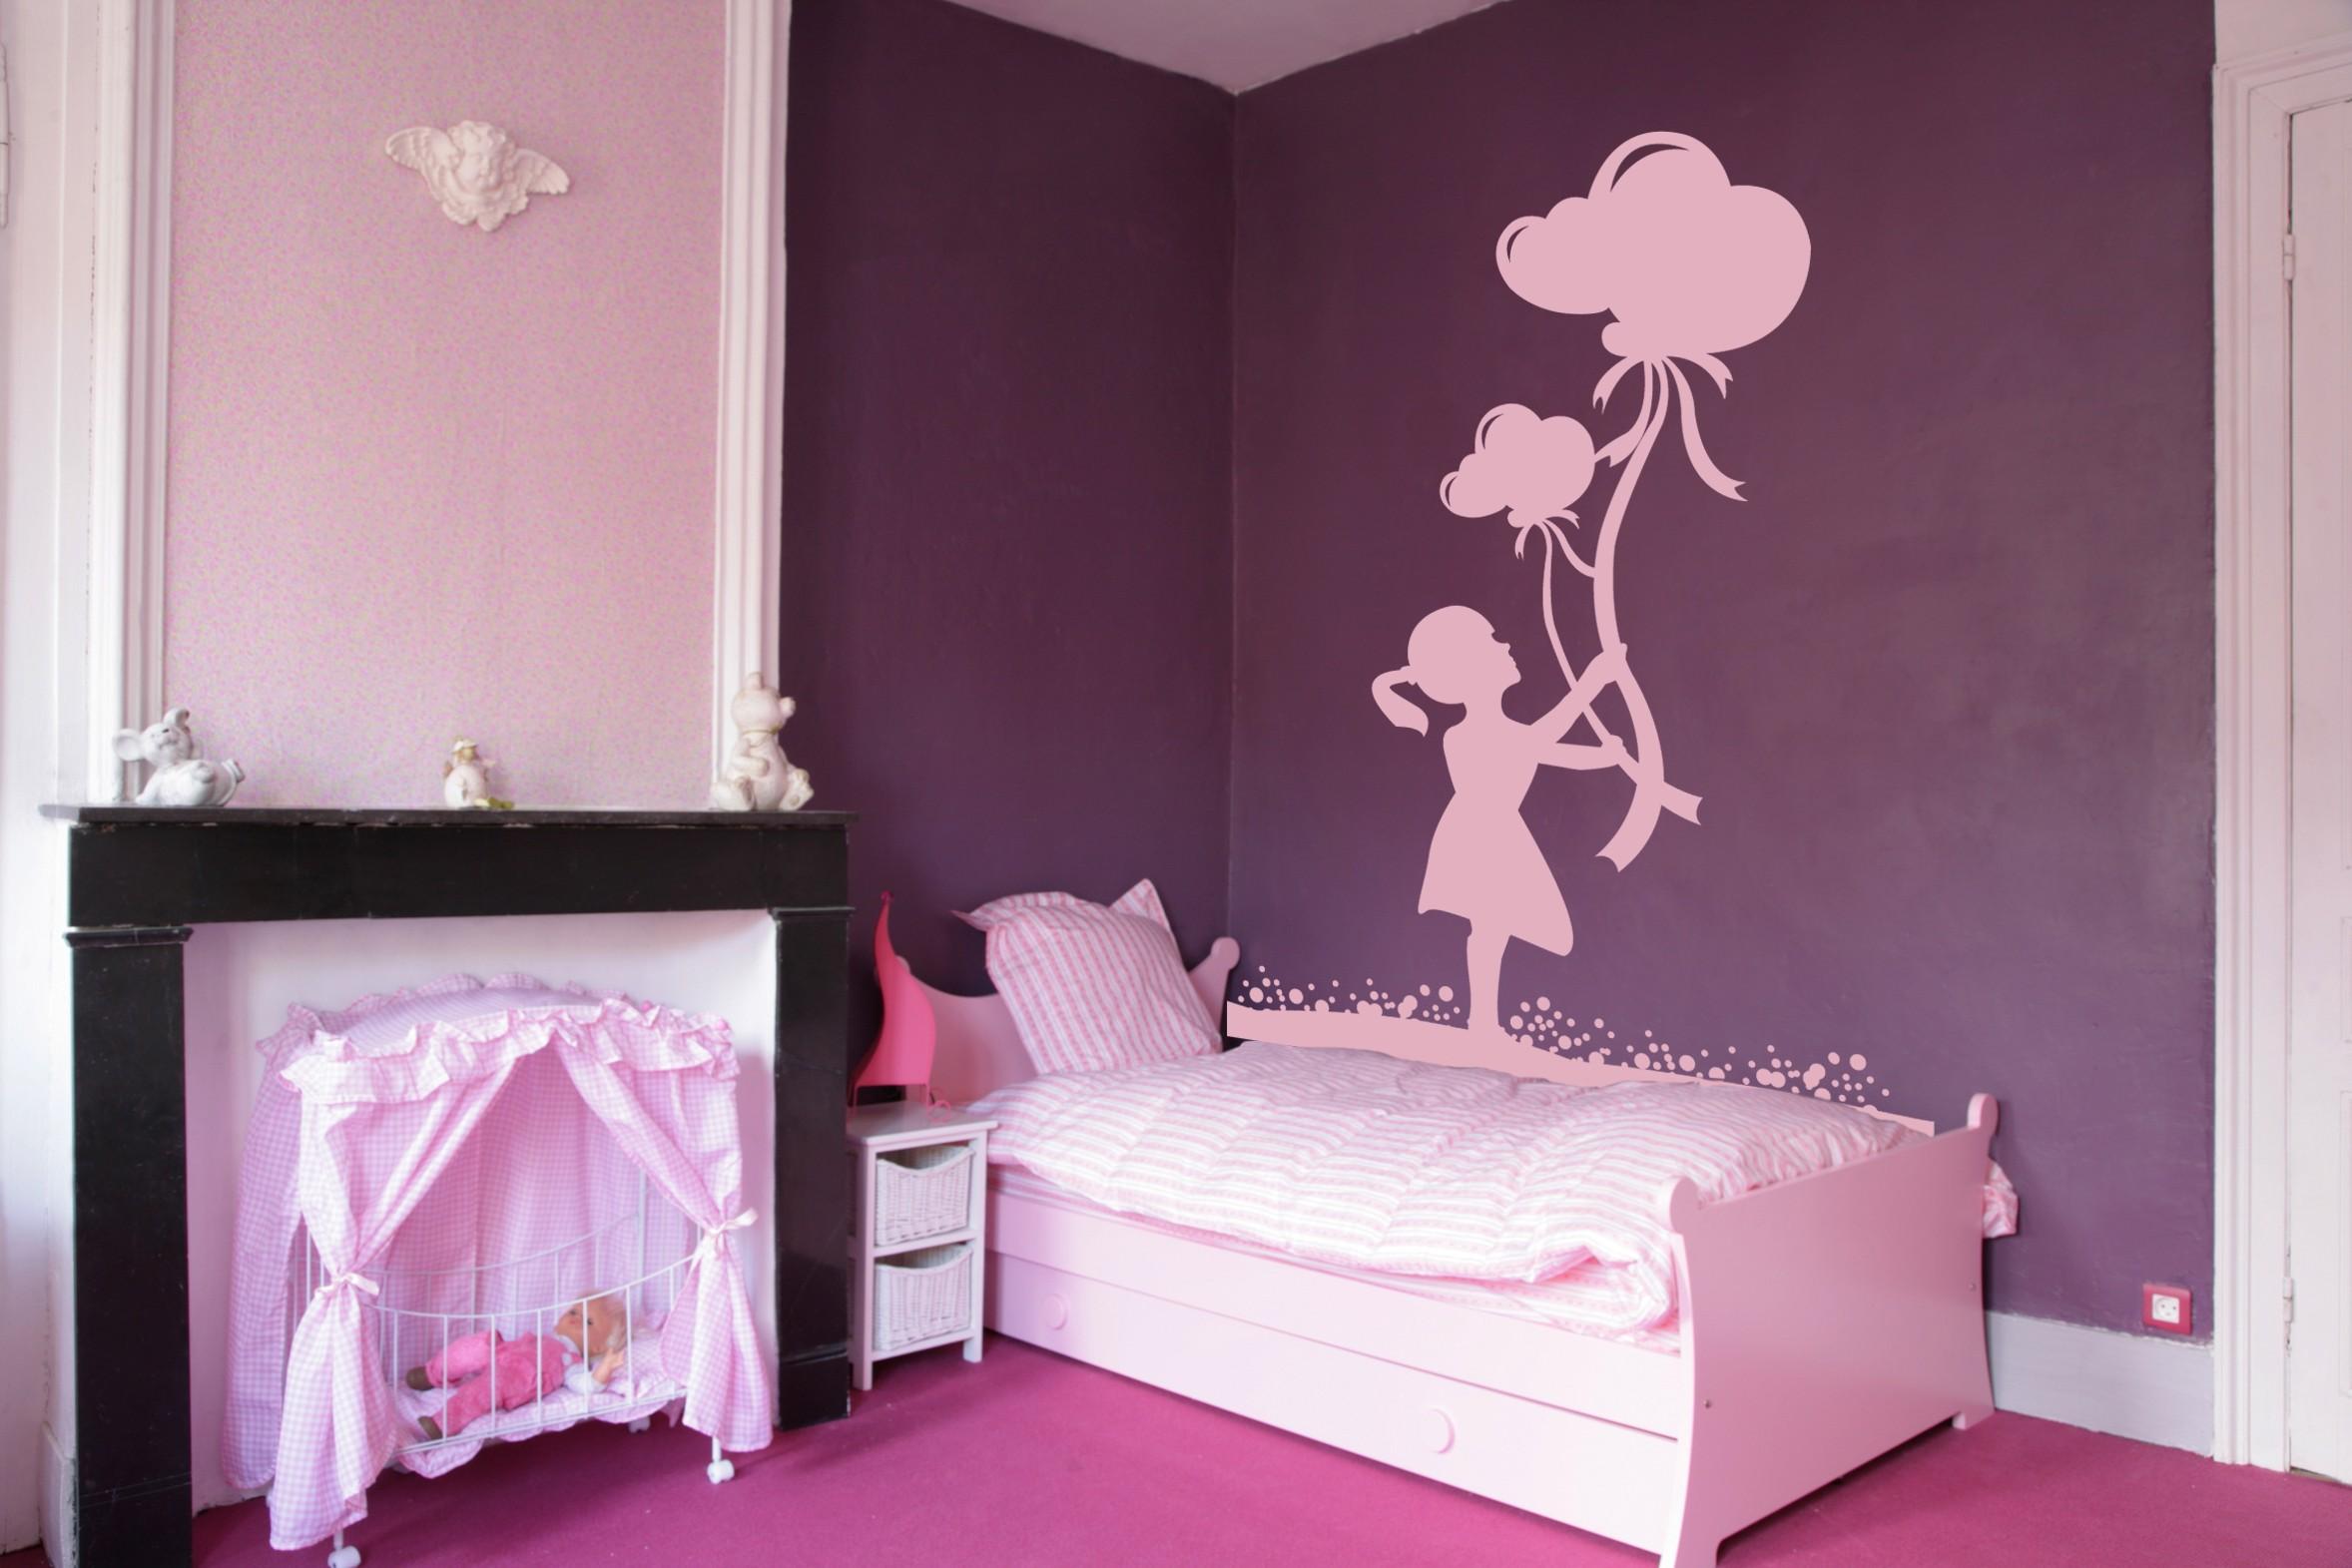 dcoration chambre bb fille papillon dcoration chambre bb